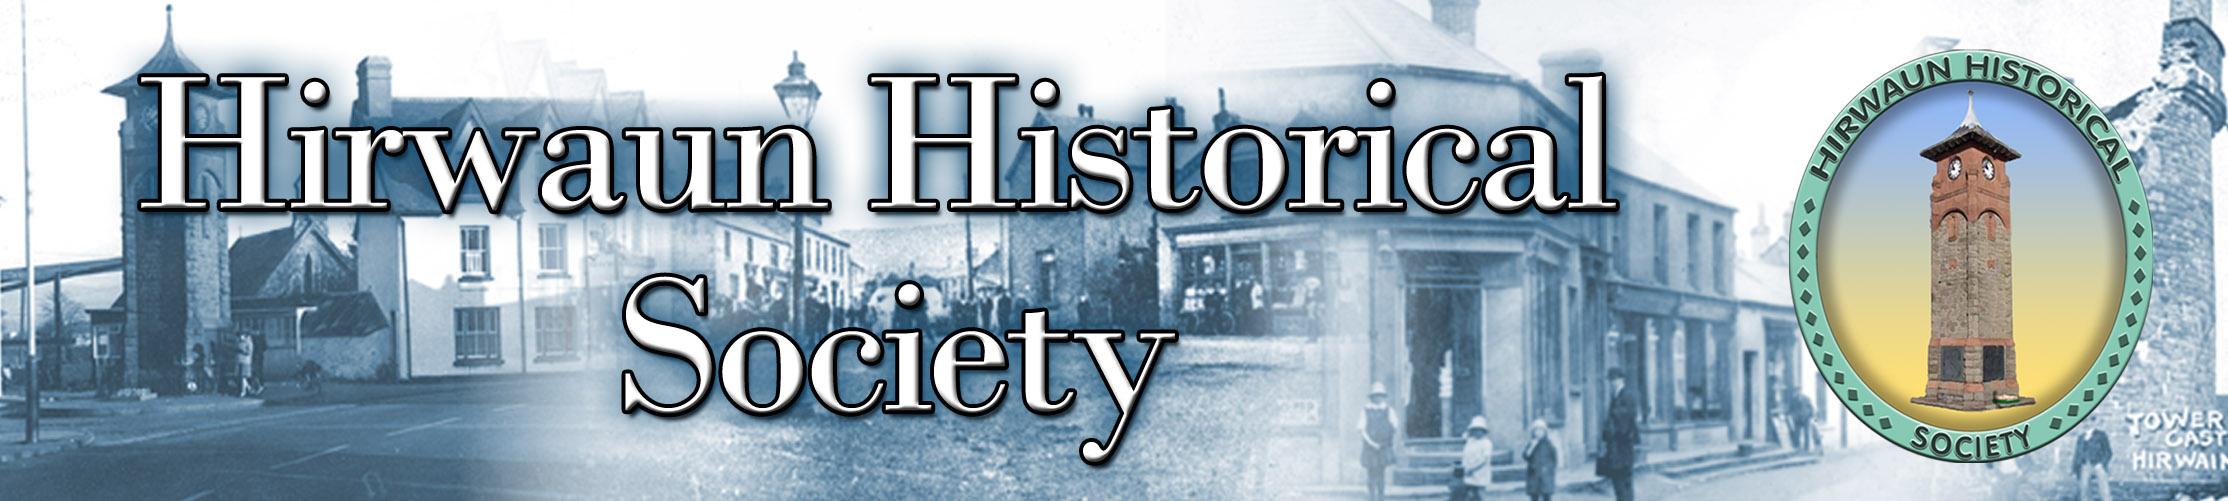 Hirwaun Historical Society